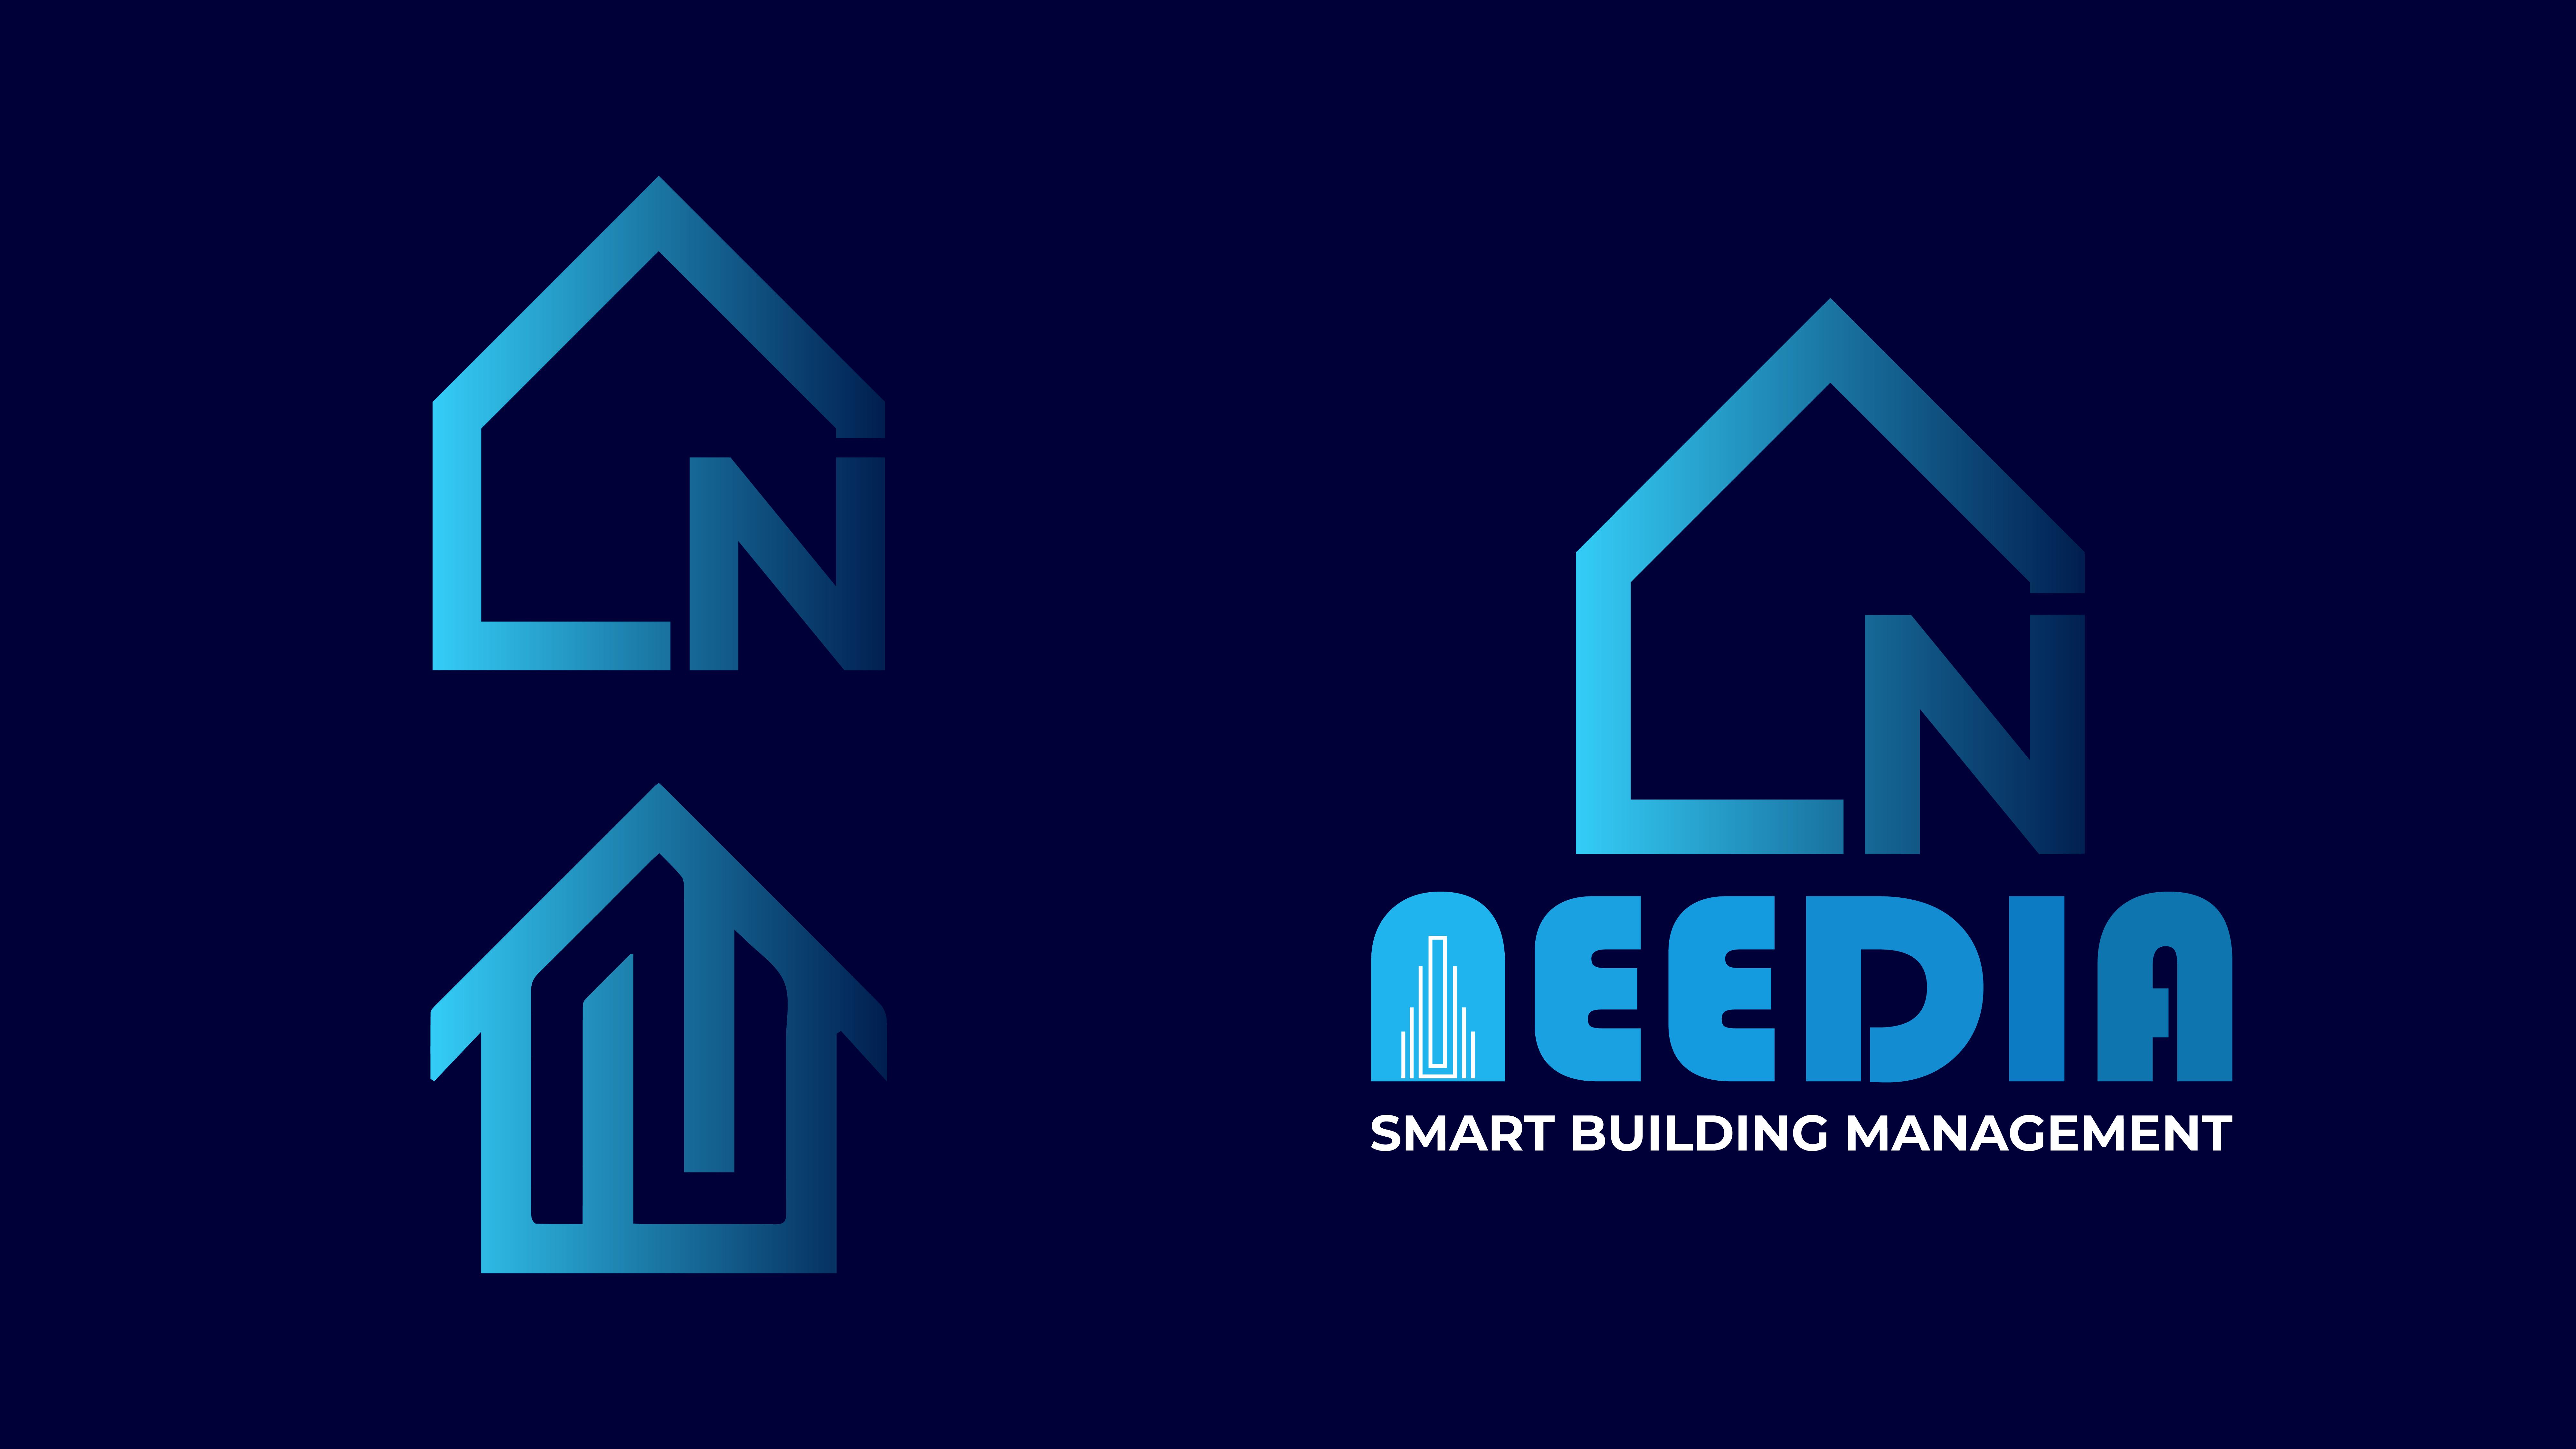 We do 03 professional real estate business logo design